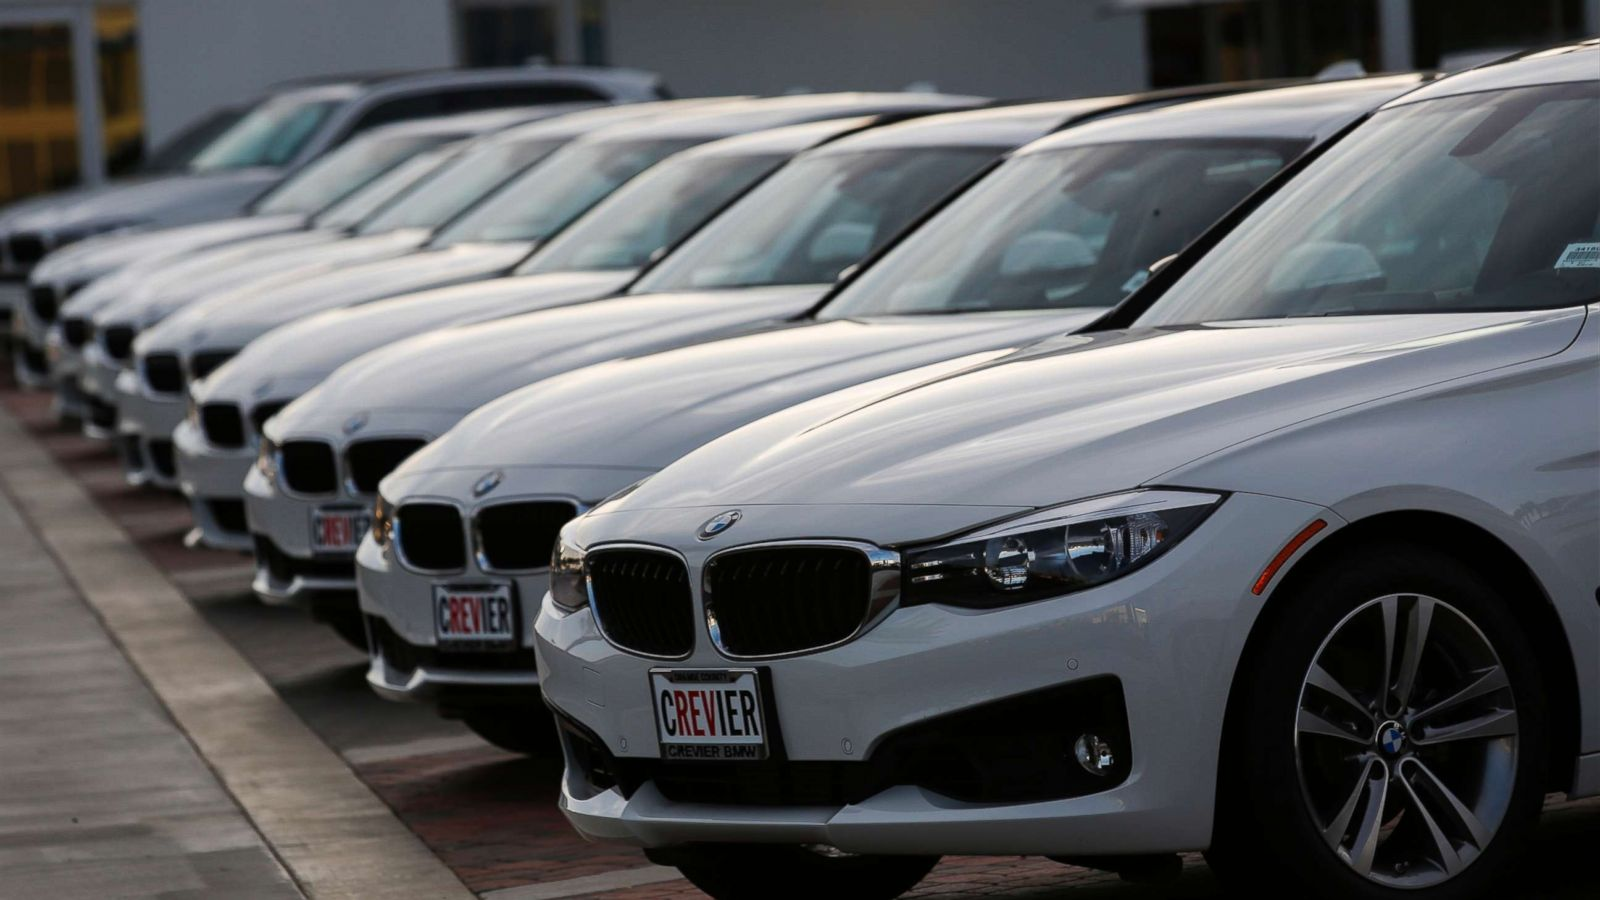 Bmw Garage Rotterdam : Bmw recalls million vehicles for fire risk abc news